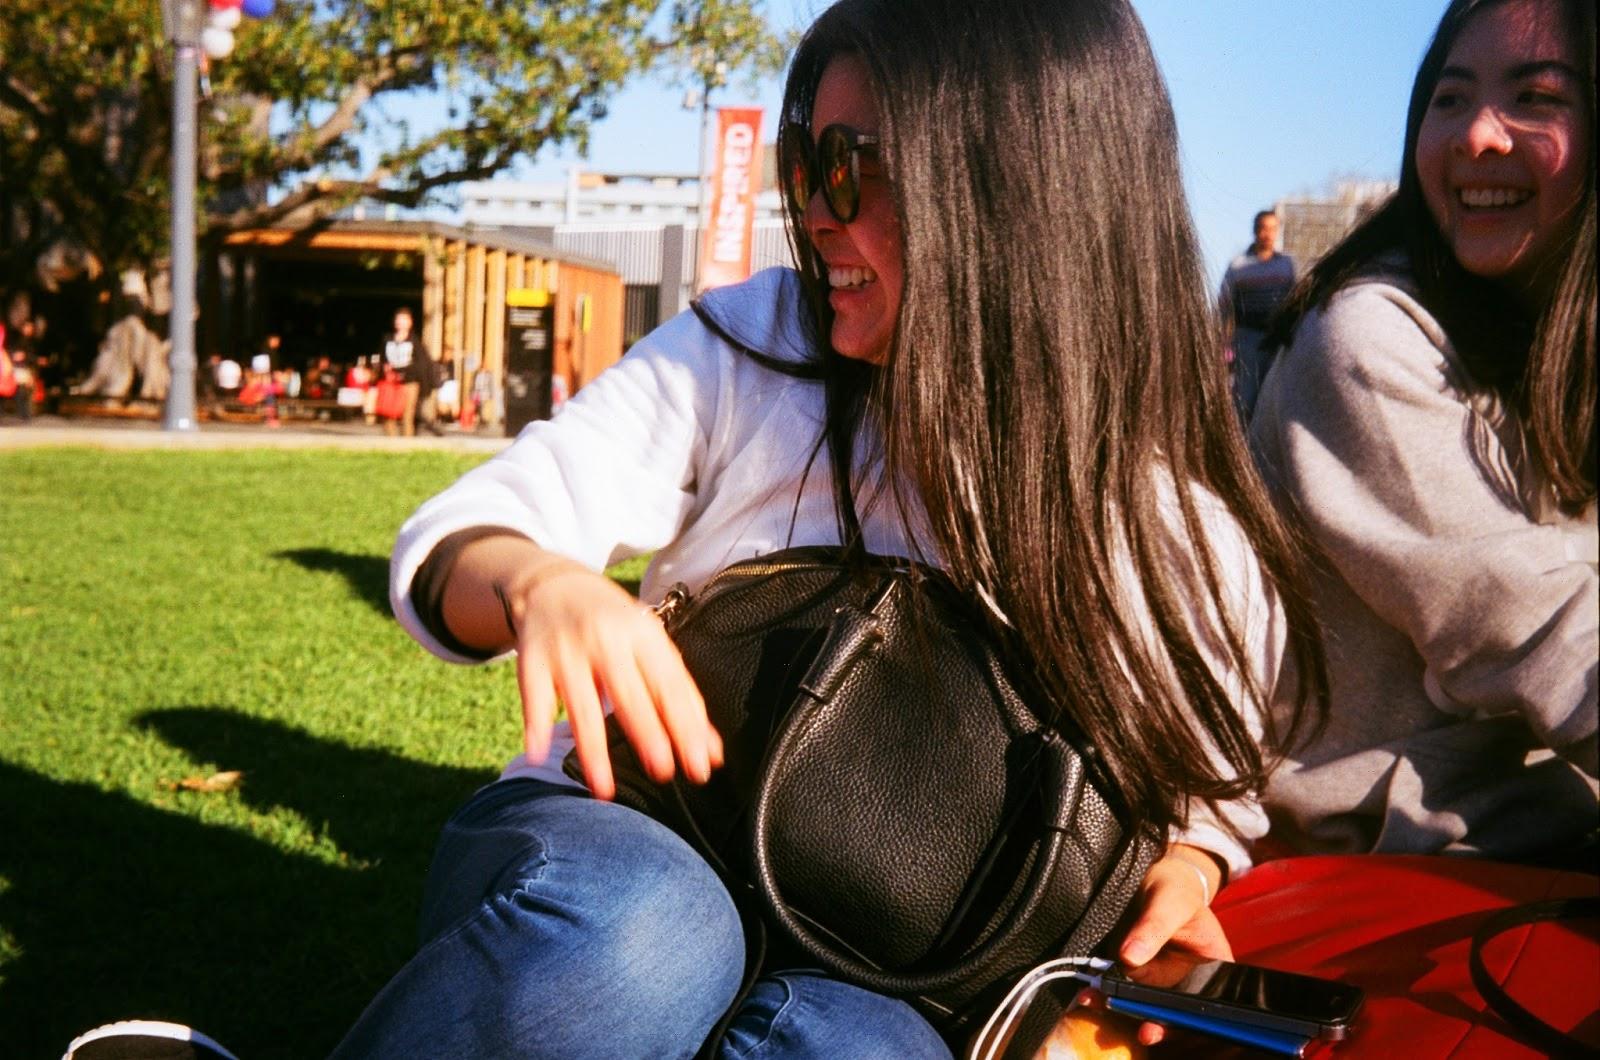 elashock, karen okuda, film, 35mm, 35mm film, photography, analogue photography, graduation, high school, thoughts, friends, school, konichiwakaren